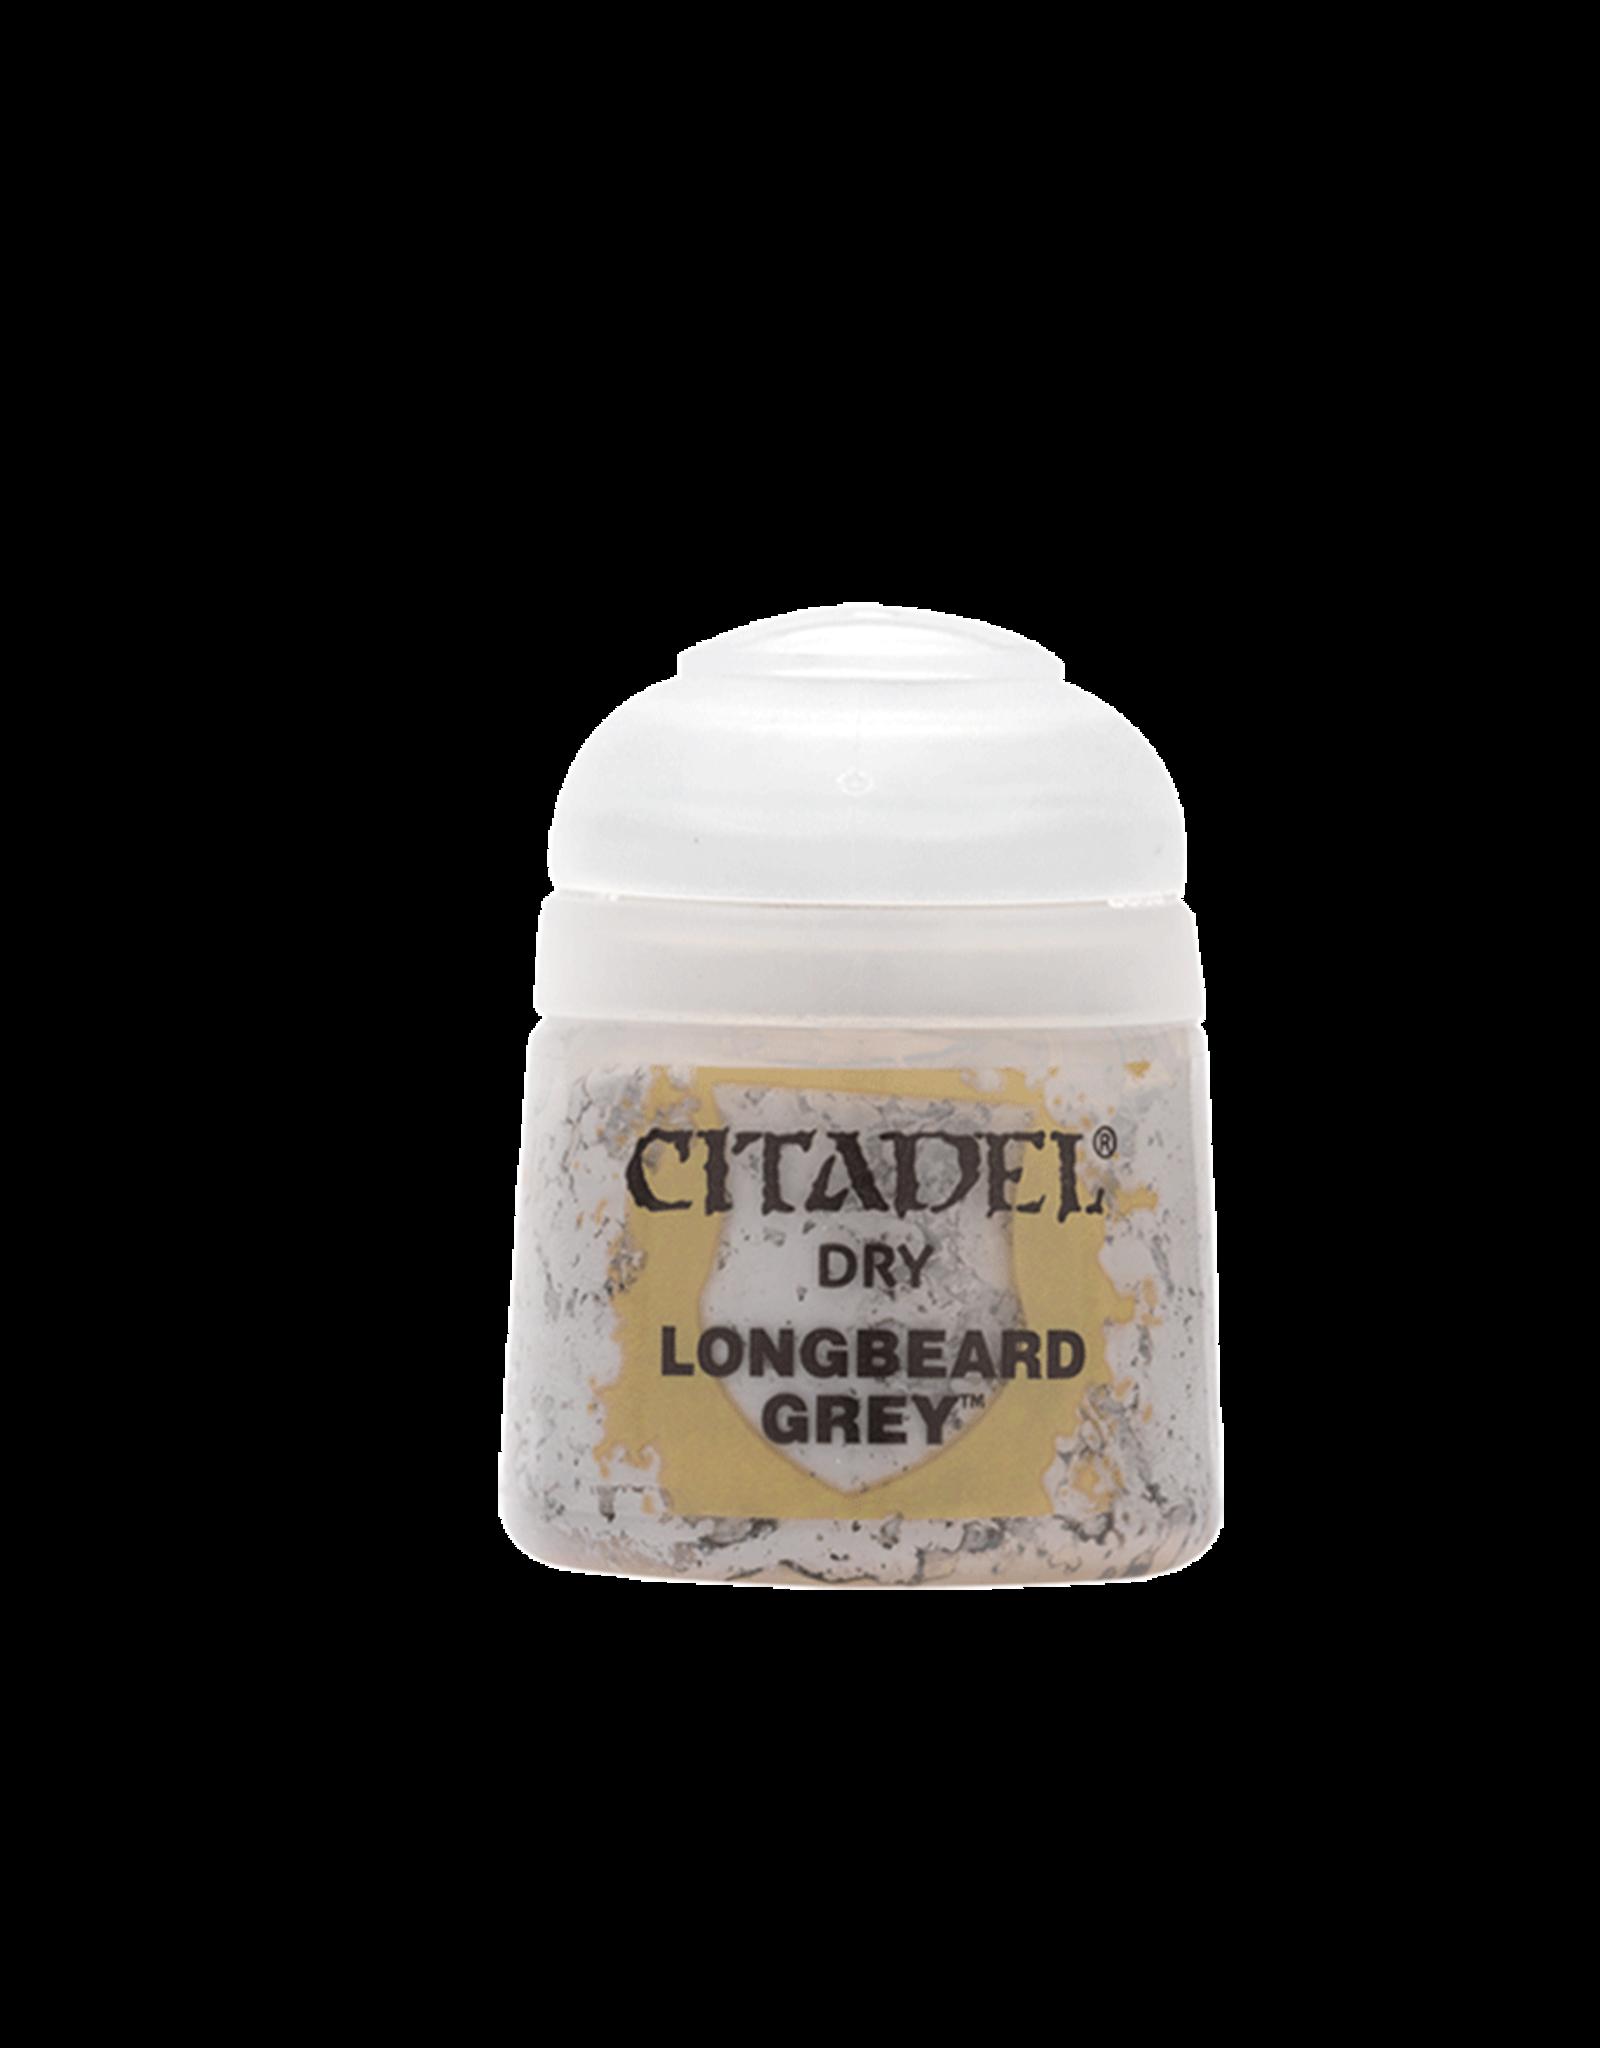 Citadel Citadel Paints Dry Paint Longbeard Grey